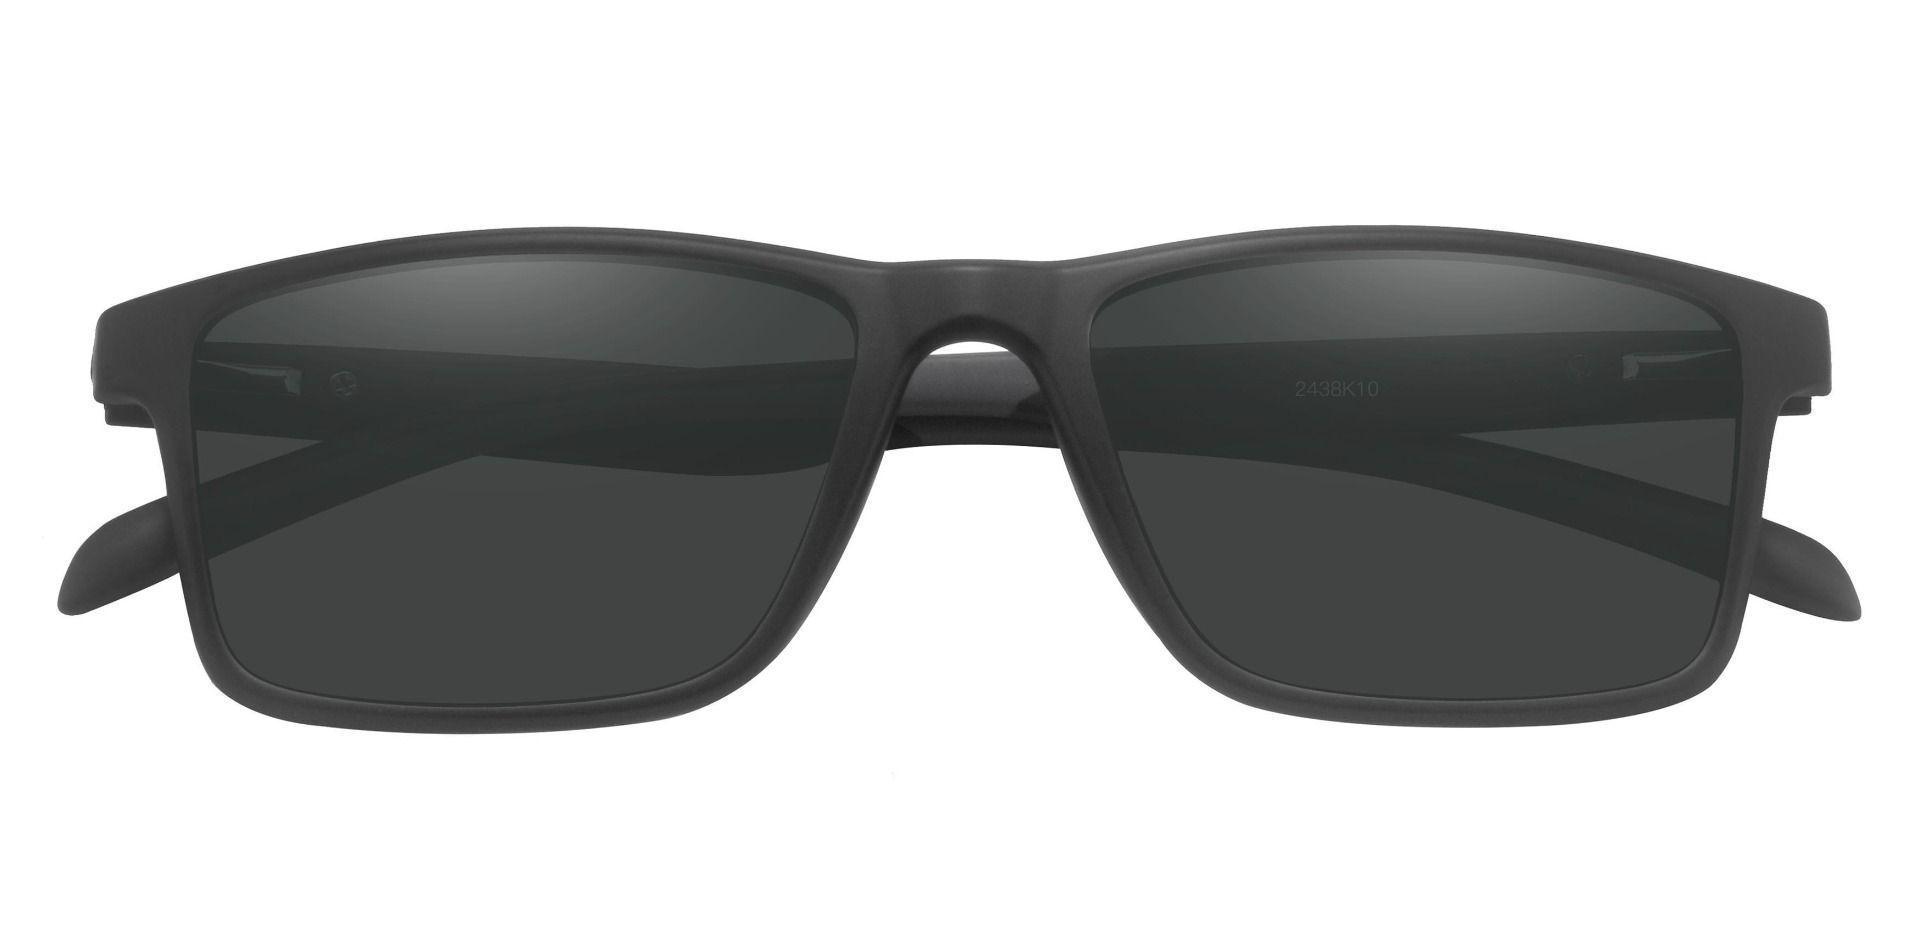 Miles Rectangle Prescription Sunglasses - Black Frame With Gray Lenses